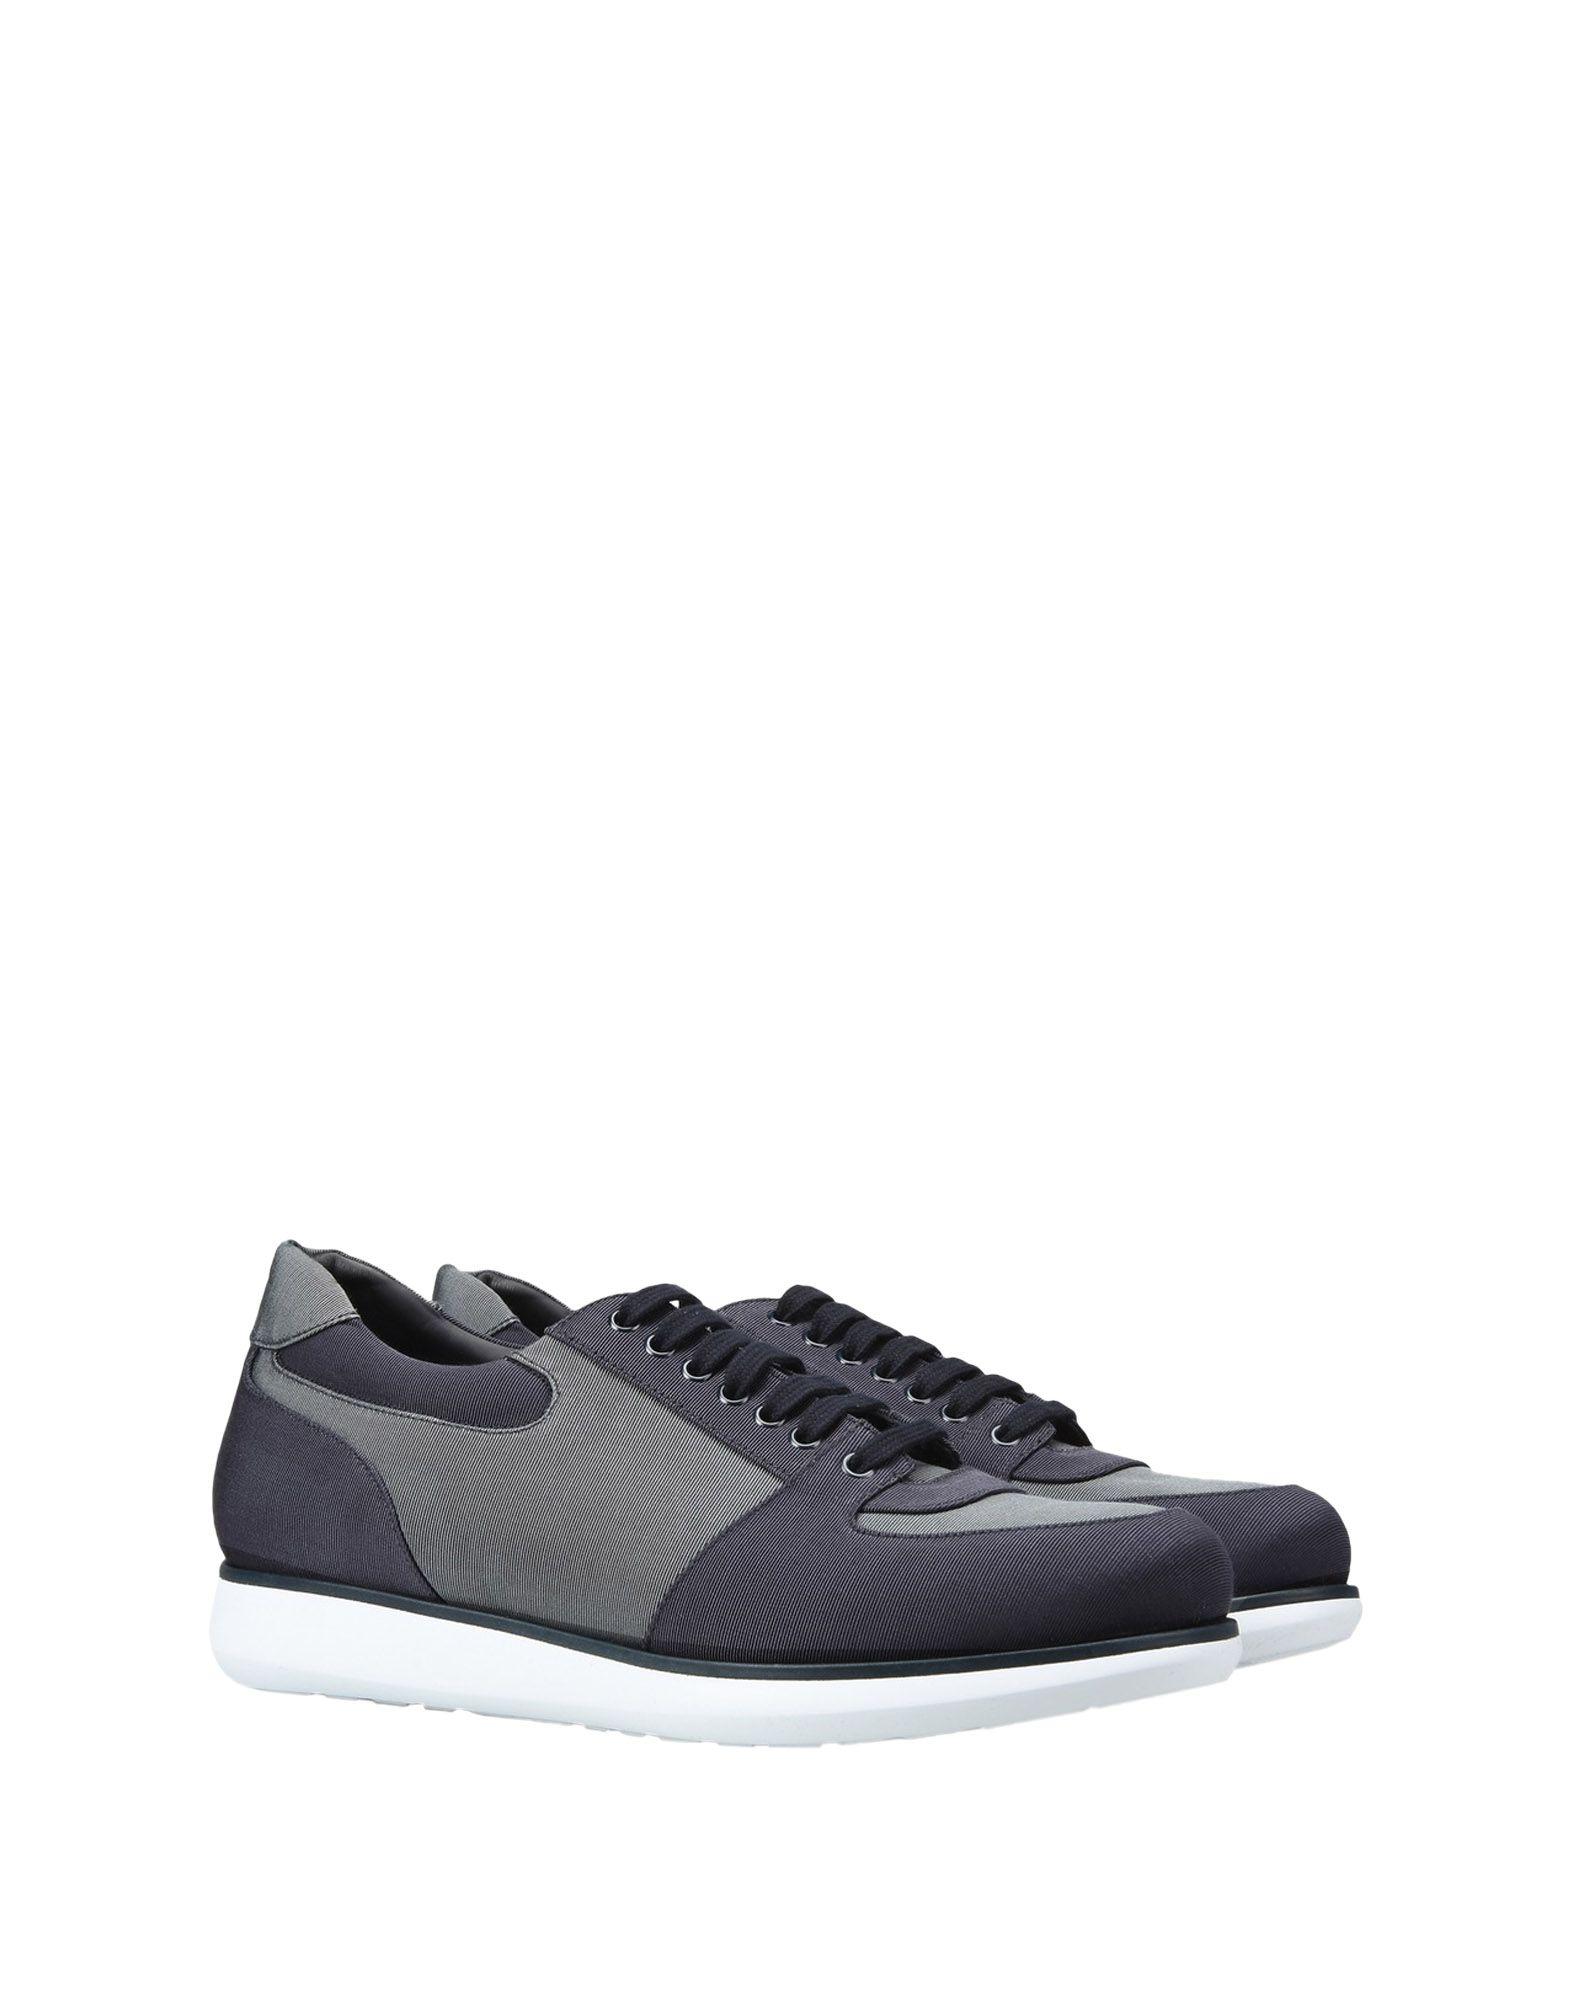 Giorgio Armani Sneakers Herren  11446884RQ Gute Qualität beliebte Schuhe